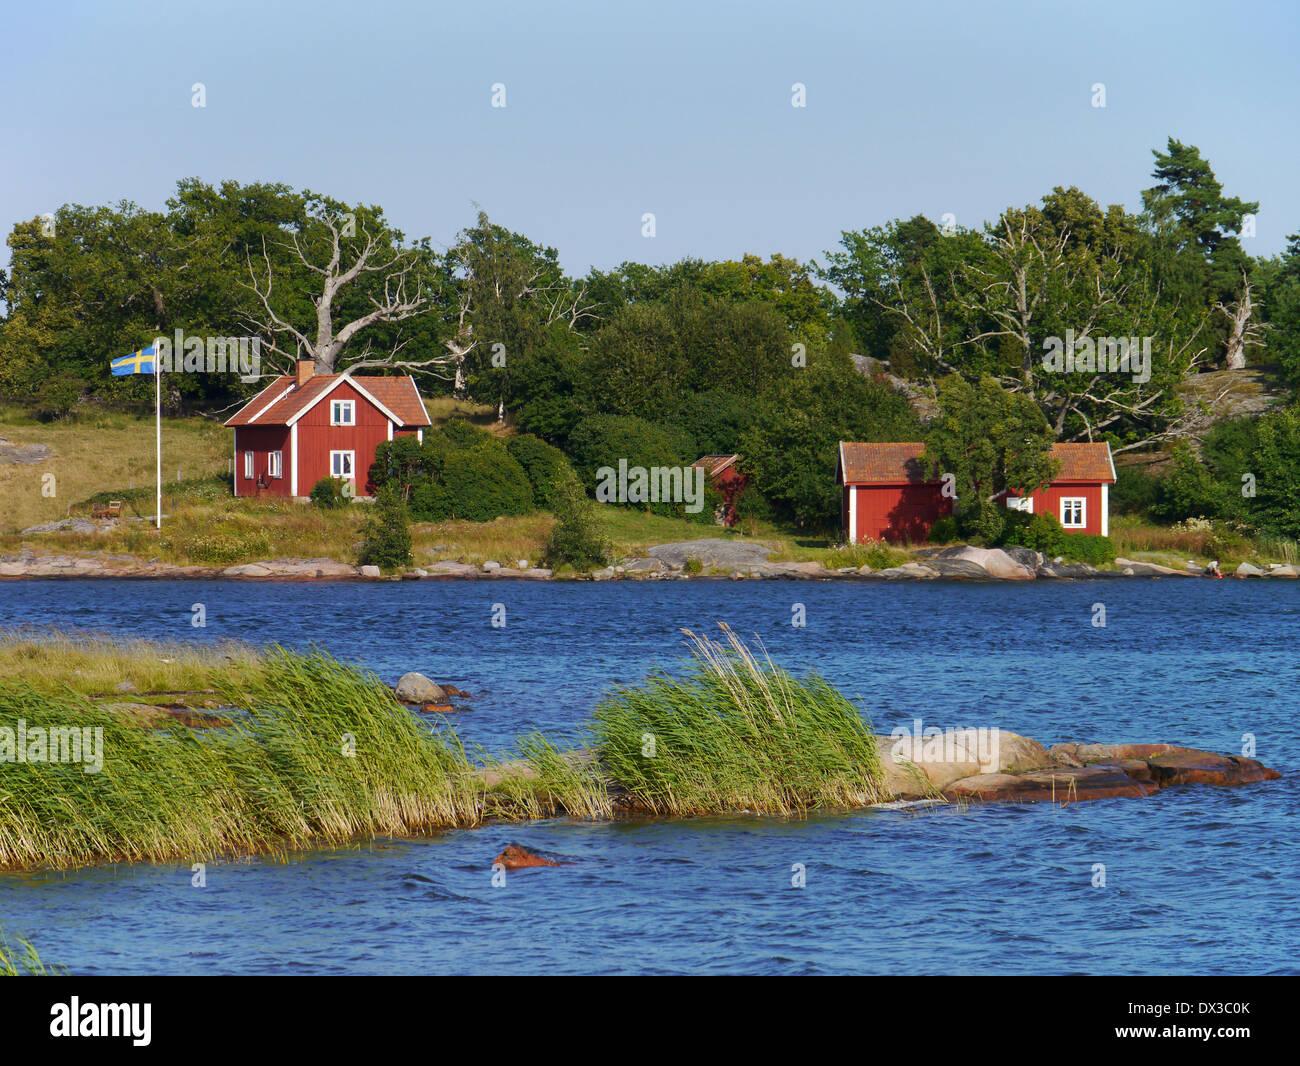 stendörren, stockholm archipelago, södermanlands län, sweden - Stock Image